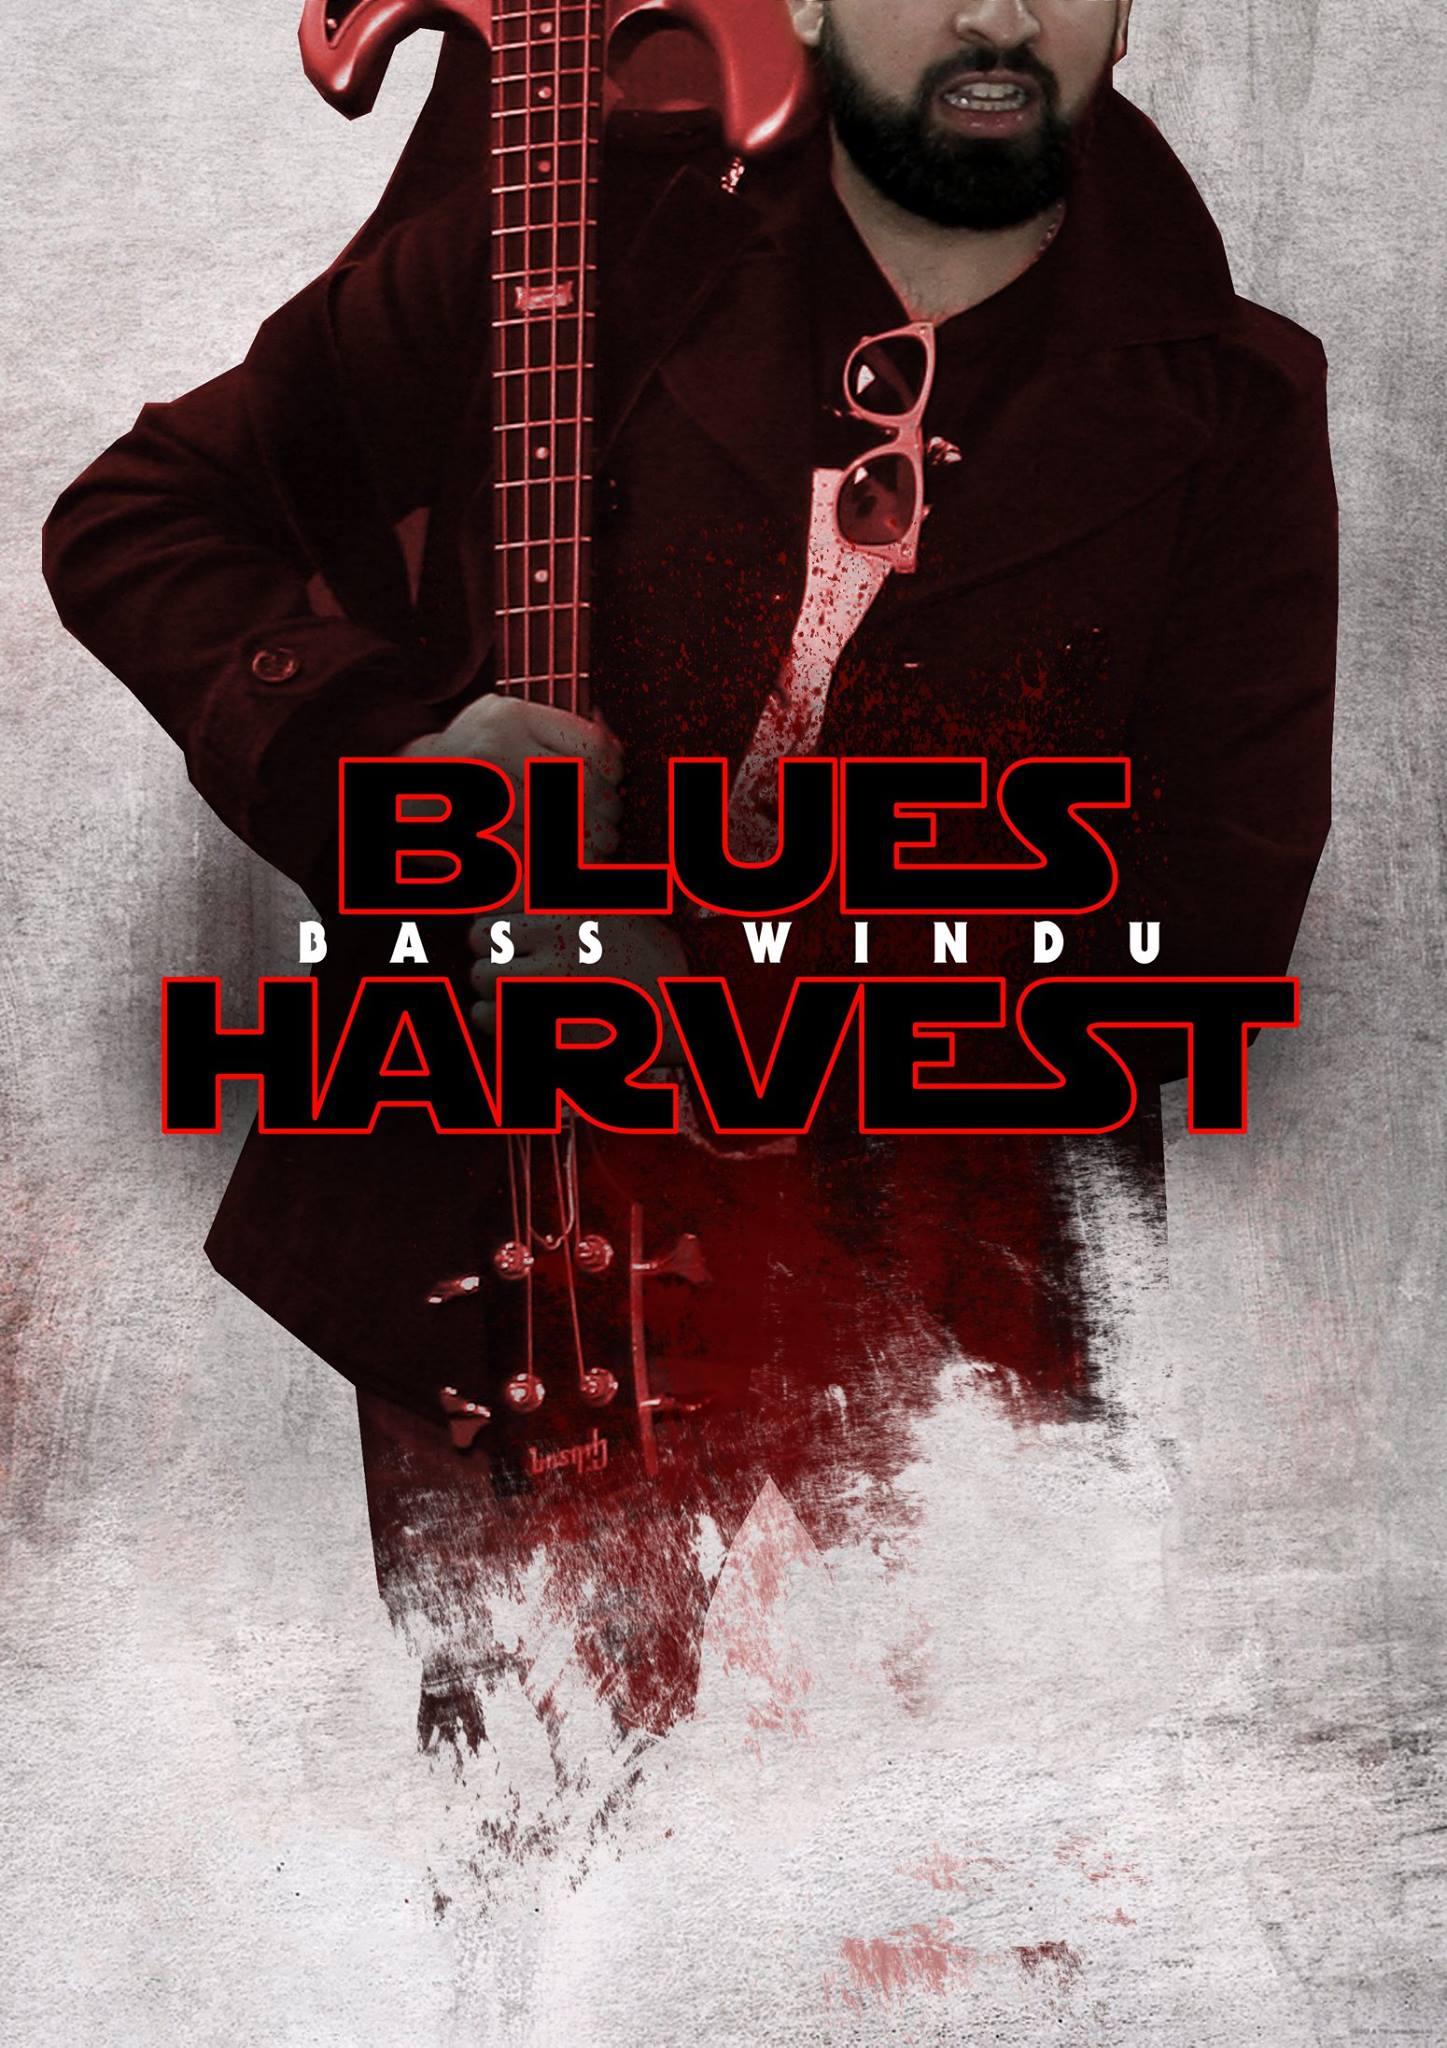 bass-windu-blues-harvest-the-last-jedi-character-posters